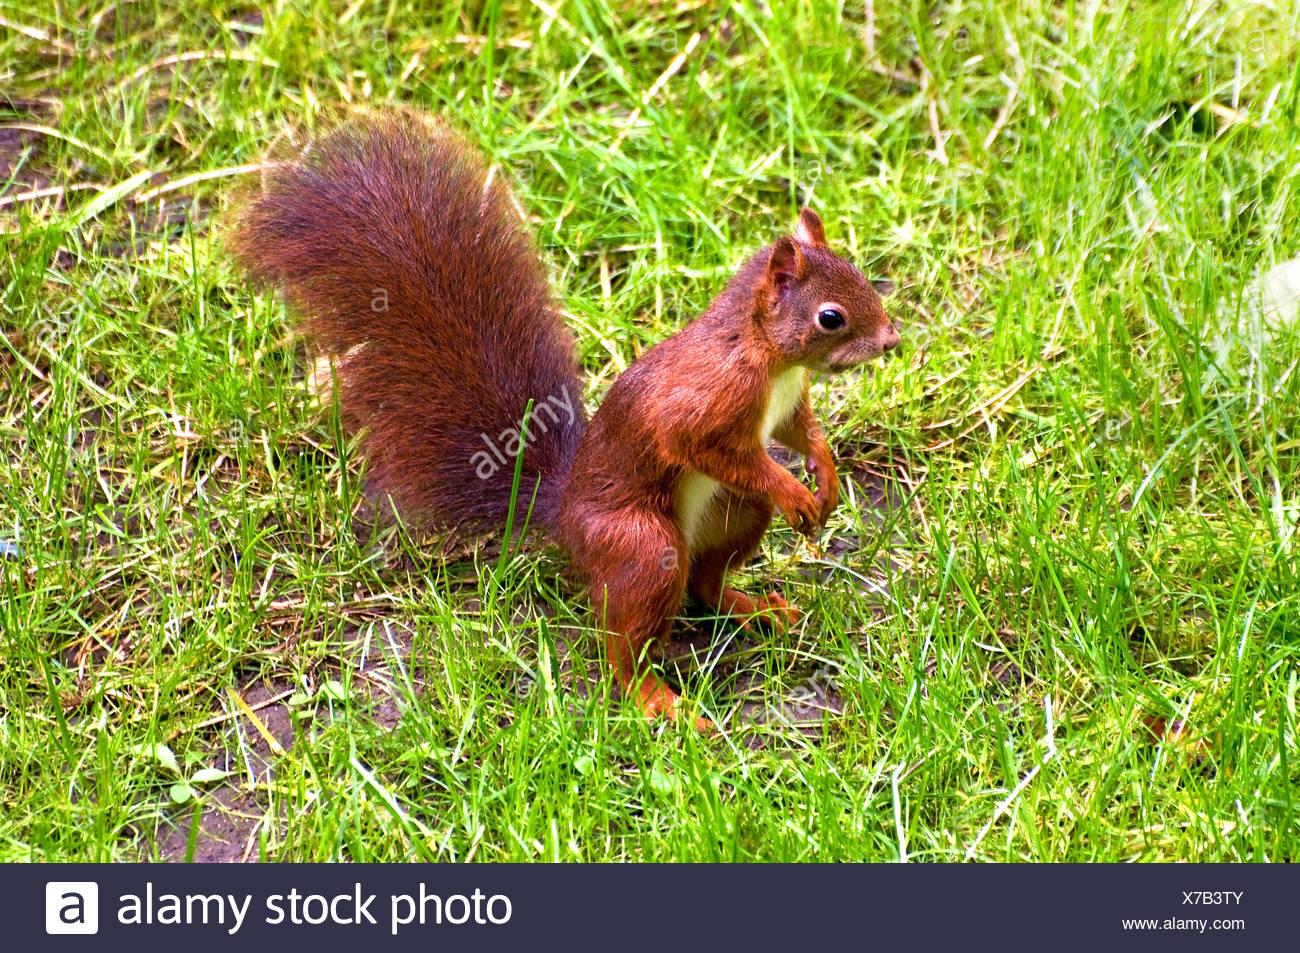 European Squirrel Stock Photo